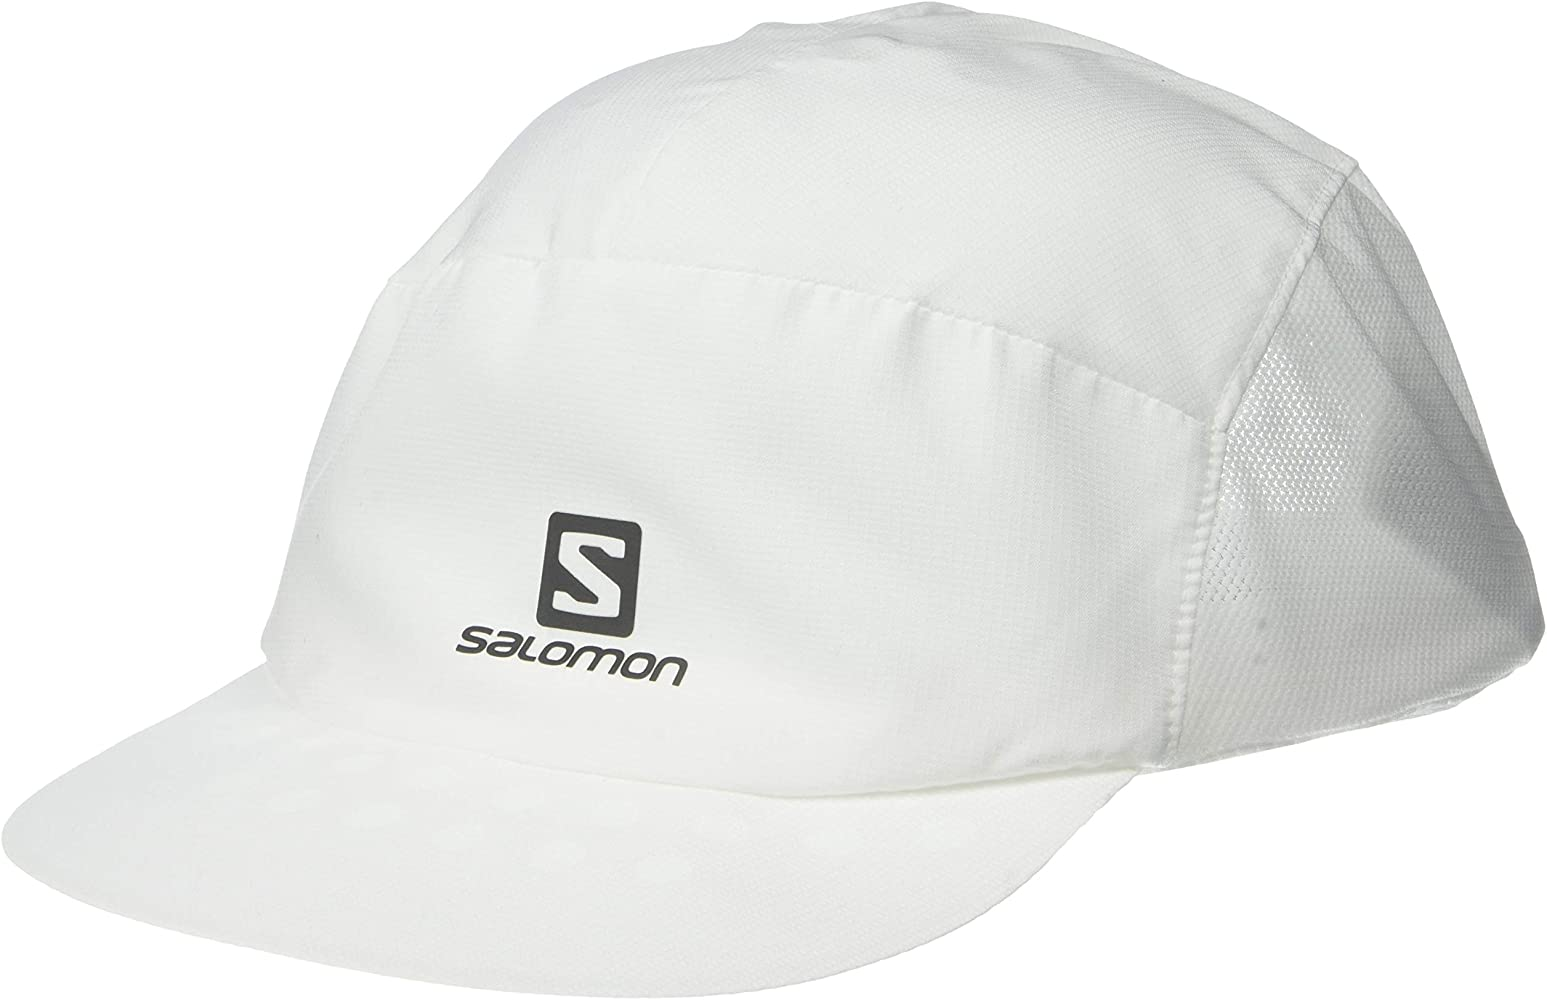 Salomon XA Compact CA Gorra Ligera para Corriendo, Unisex Adulto ...